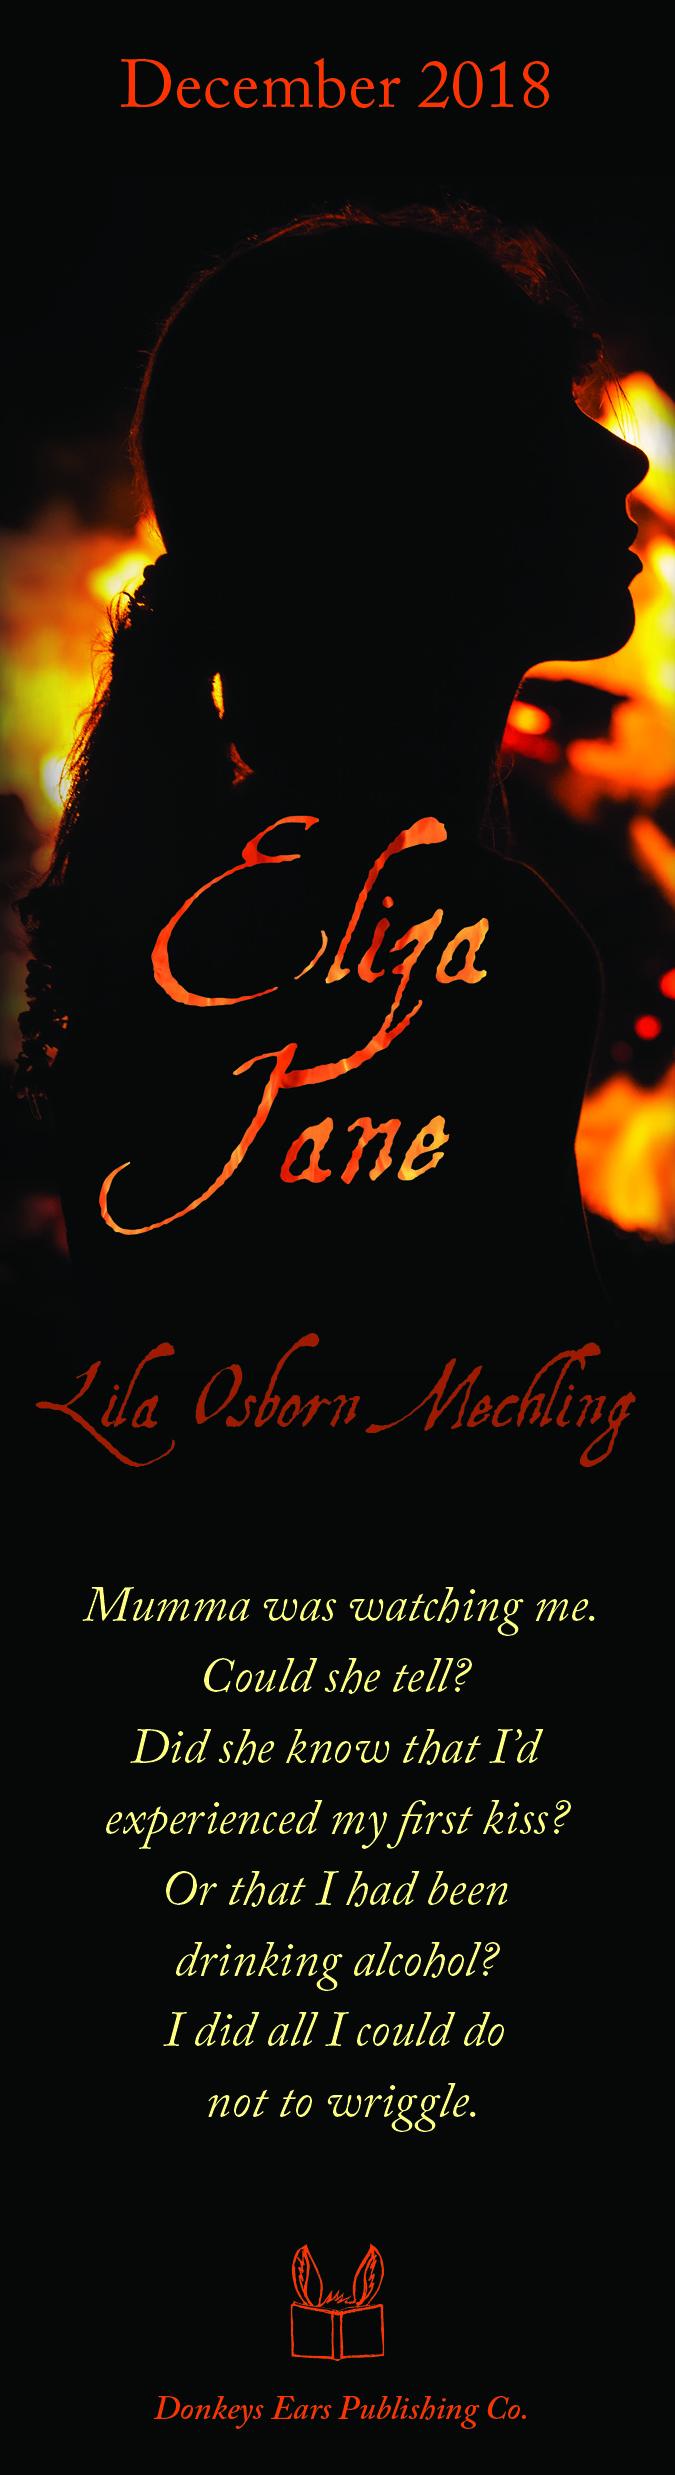 Bookmark for Eliza Jane by Lila Osborn Mechling (Donkey Ears Publishing, December 2018)